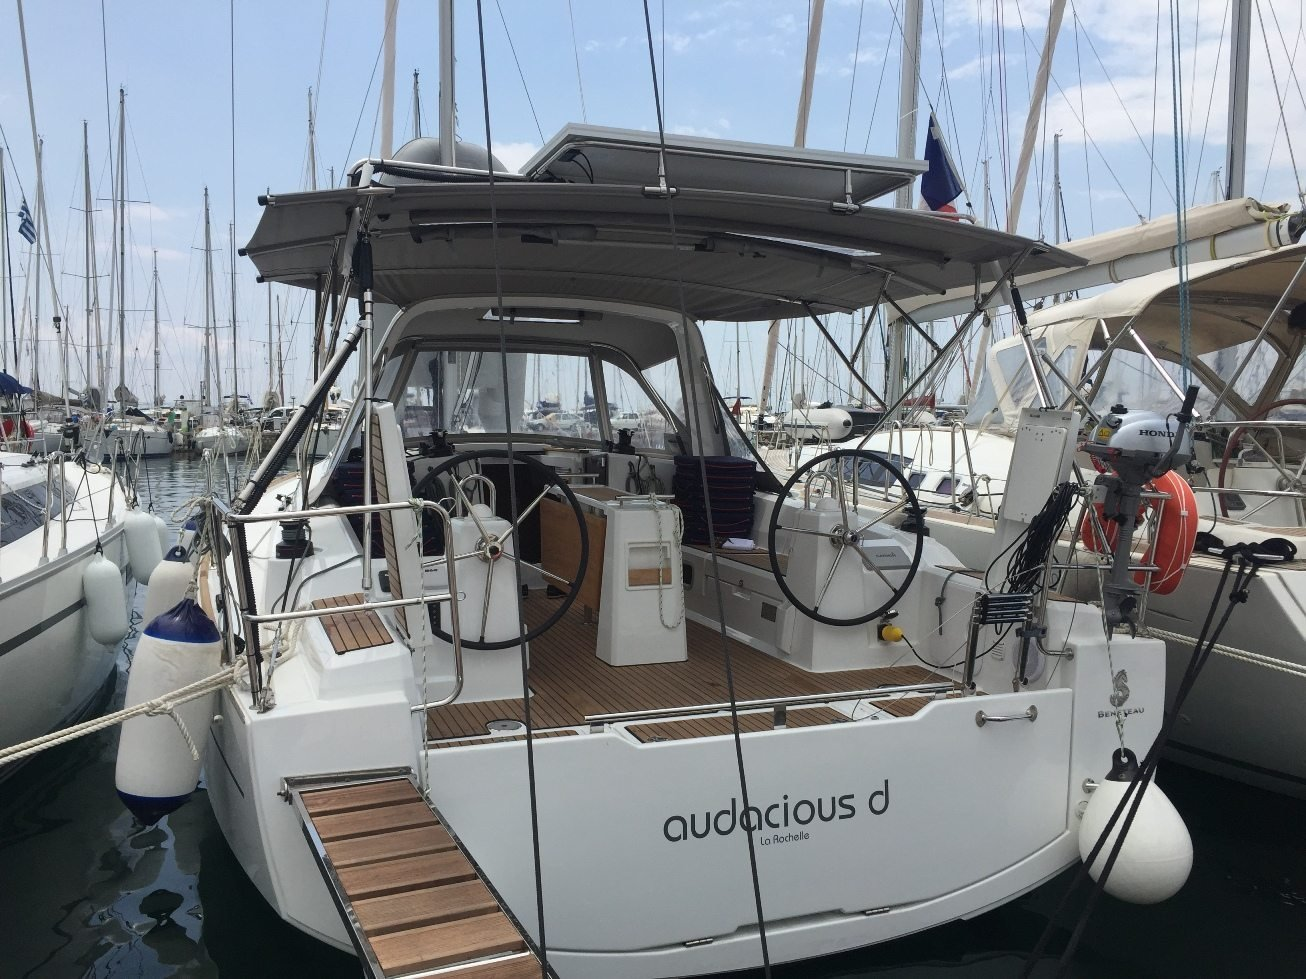 Beneteau Oceanis 38 Audacious D 1